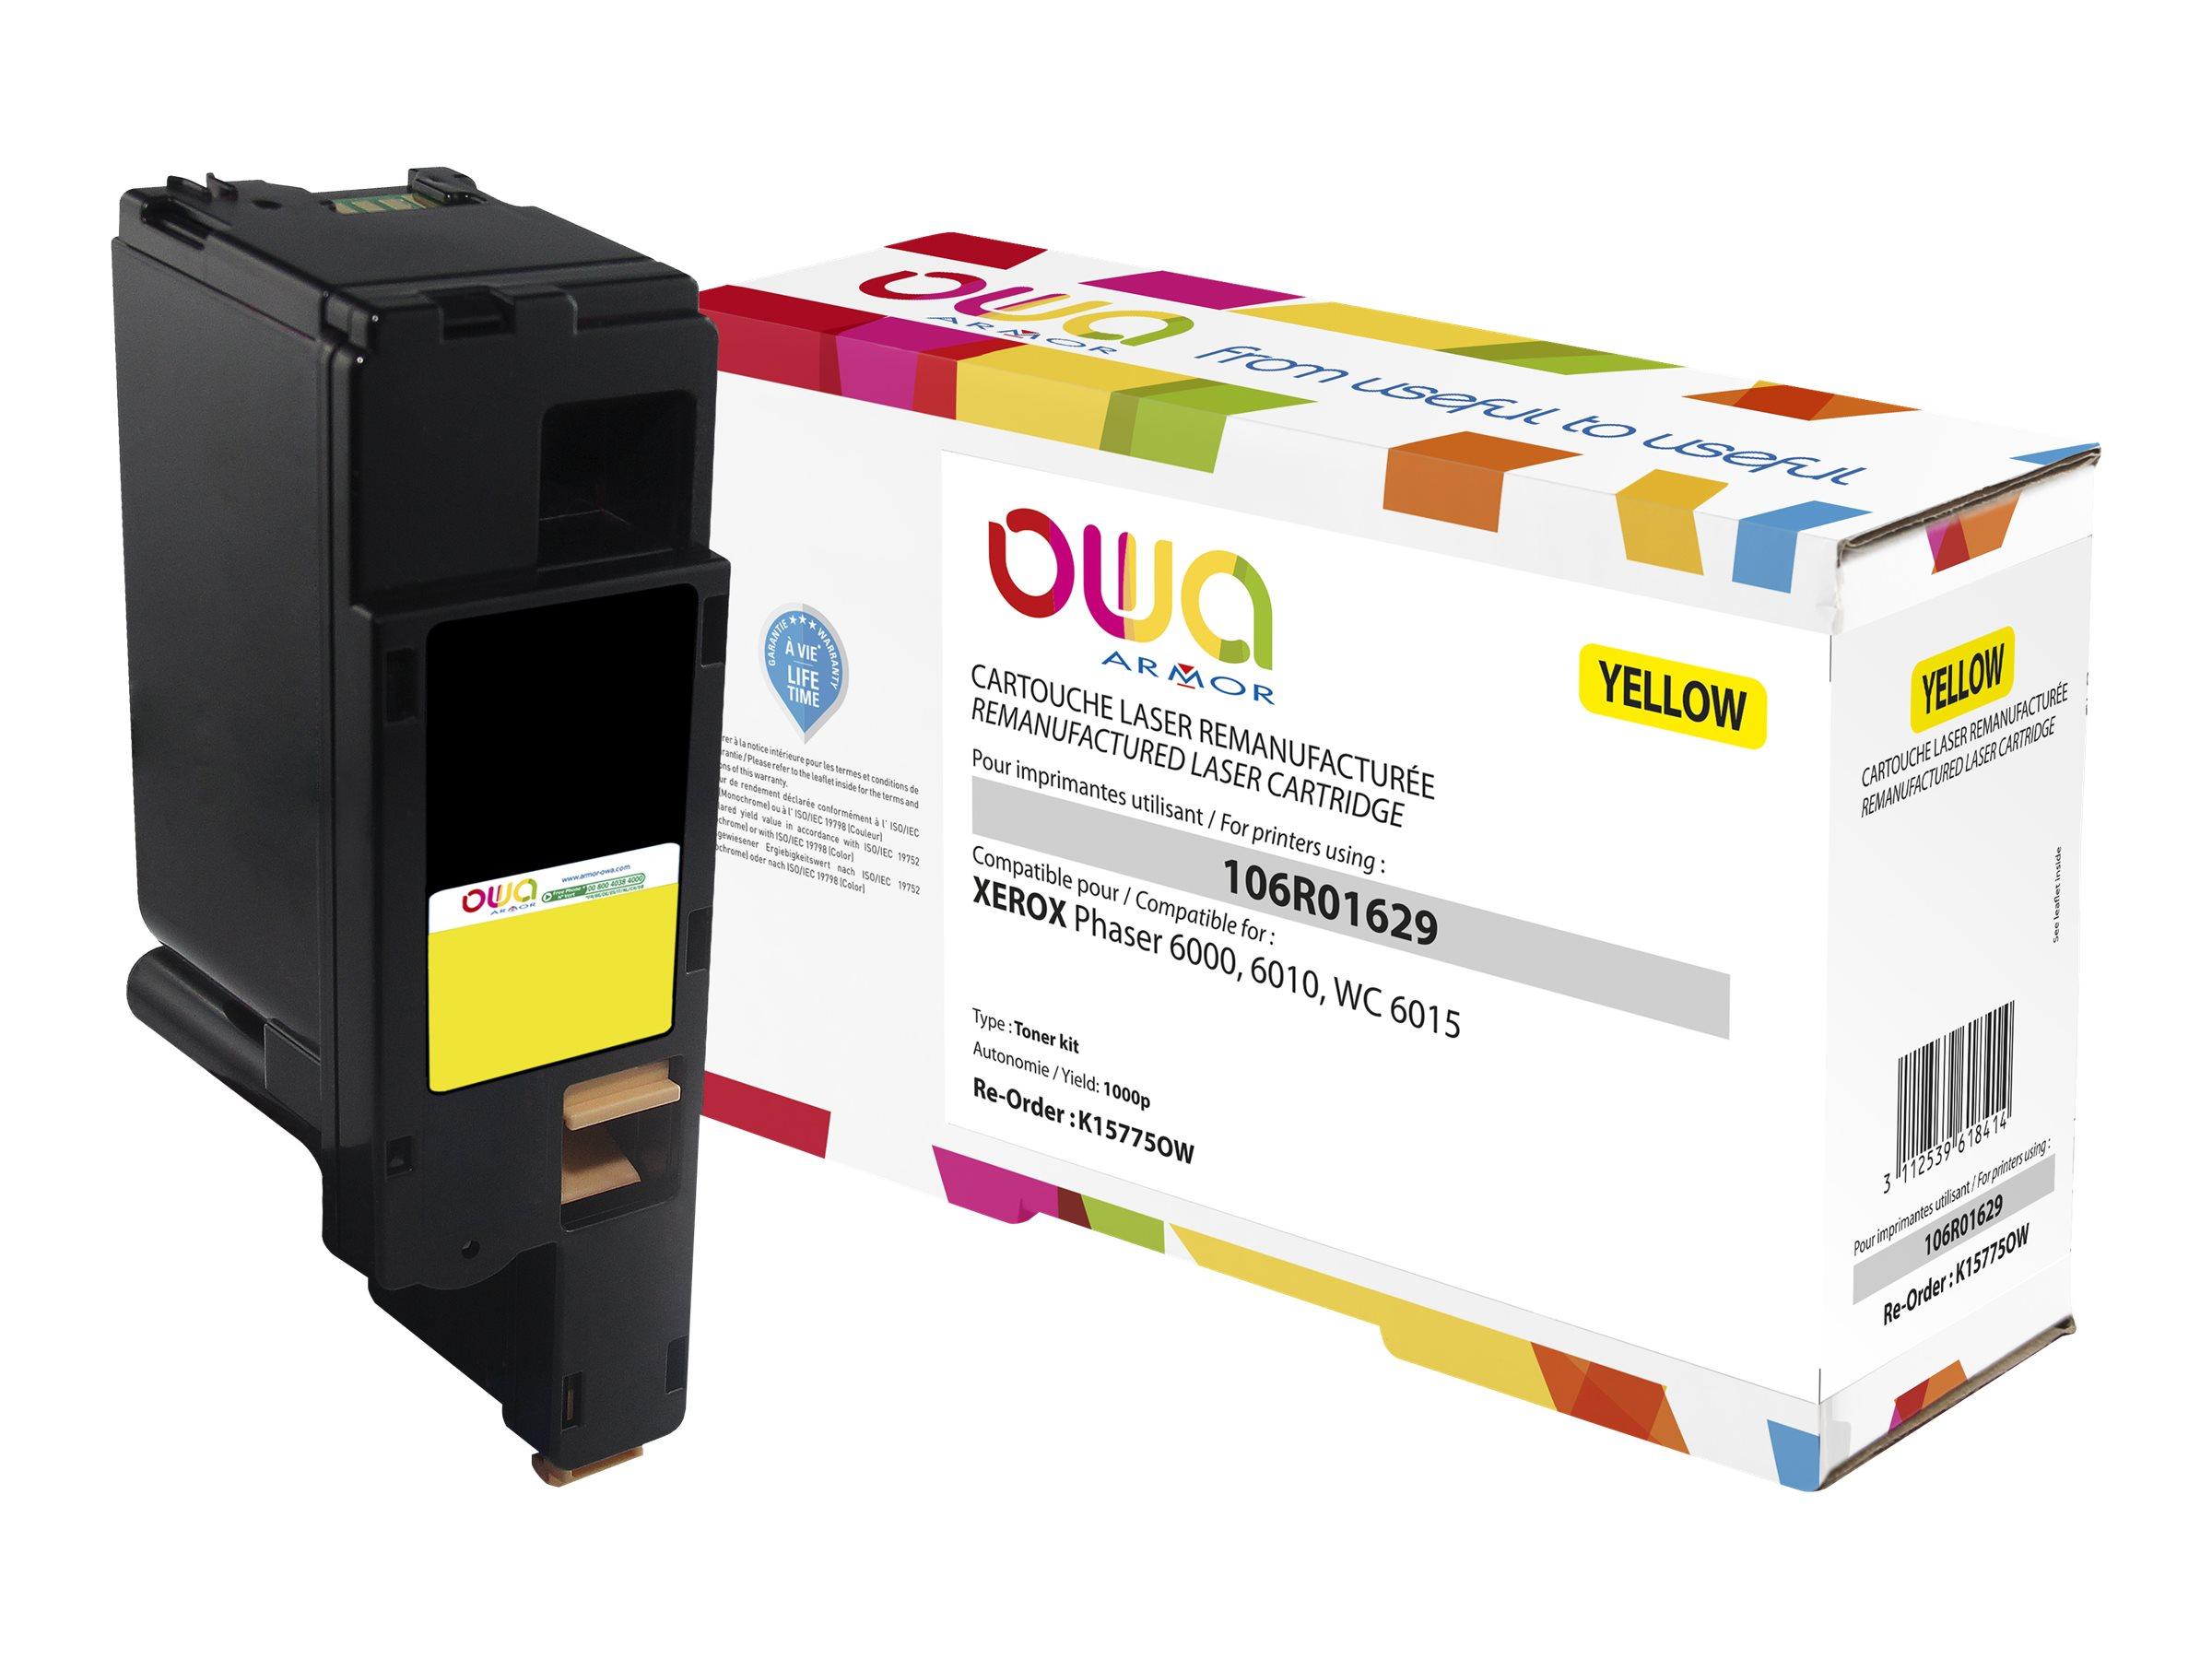 Xerox 106R01629 - remanufacturé OWA K15775OW - jaune - cartouche laser